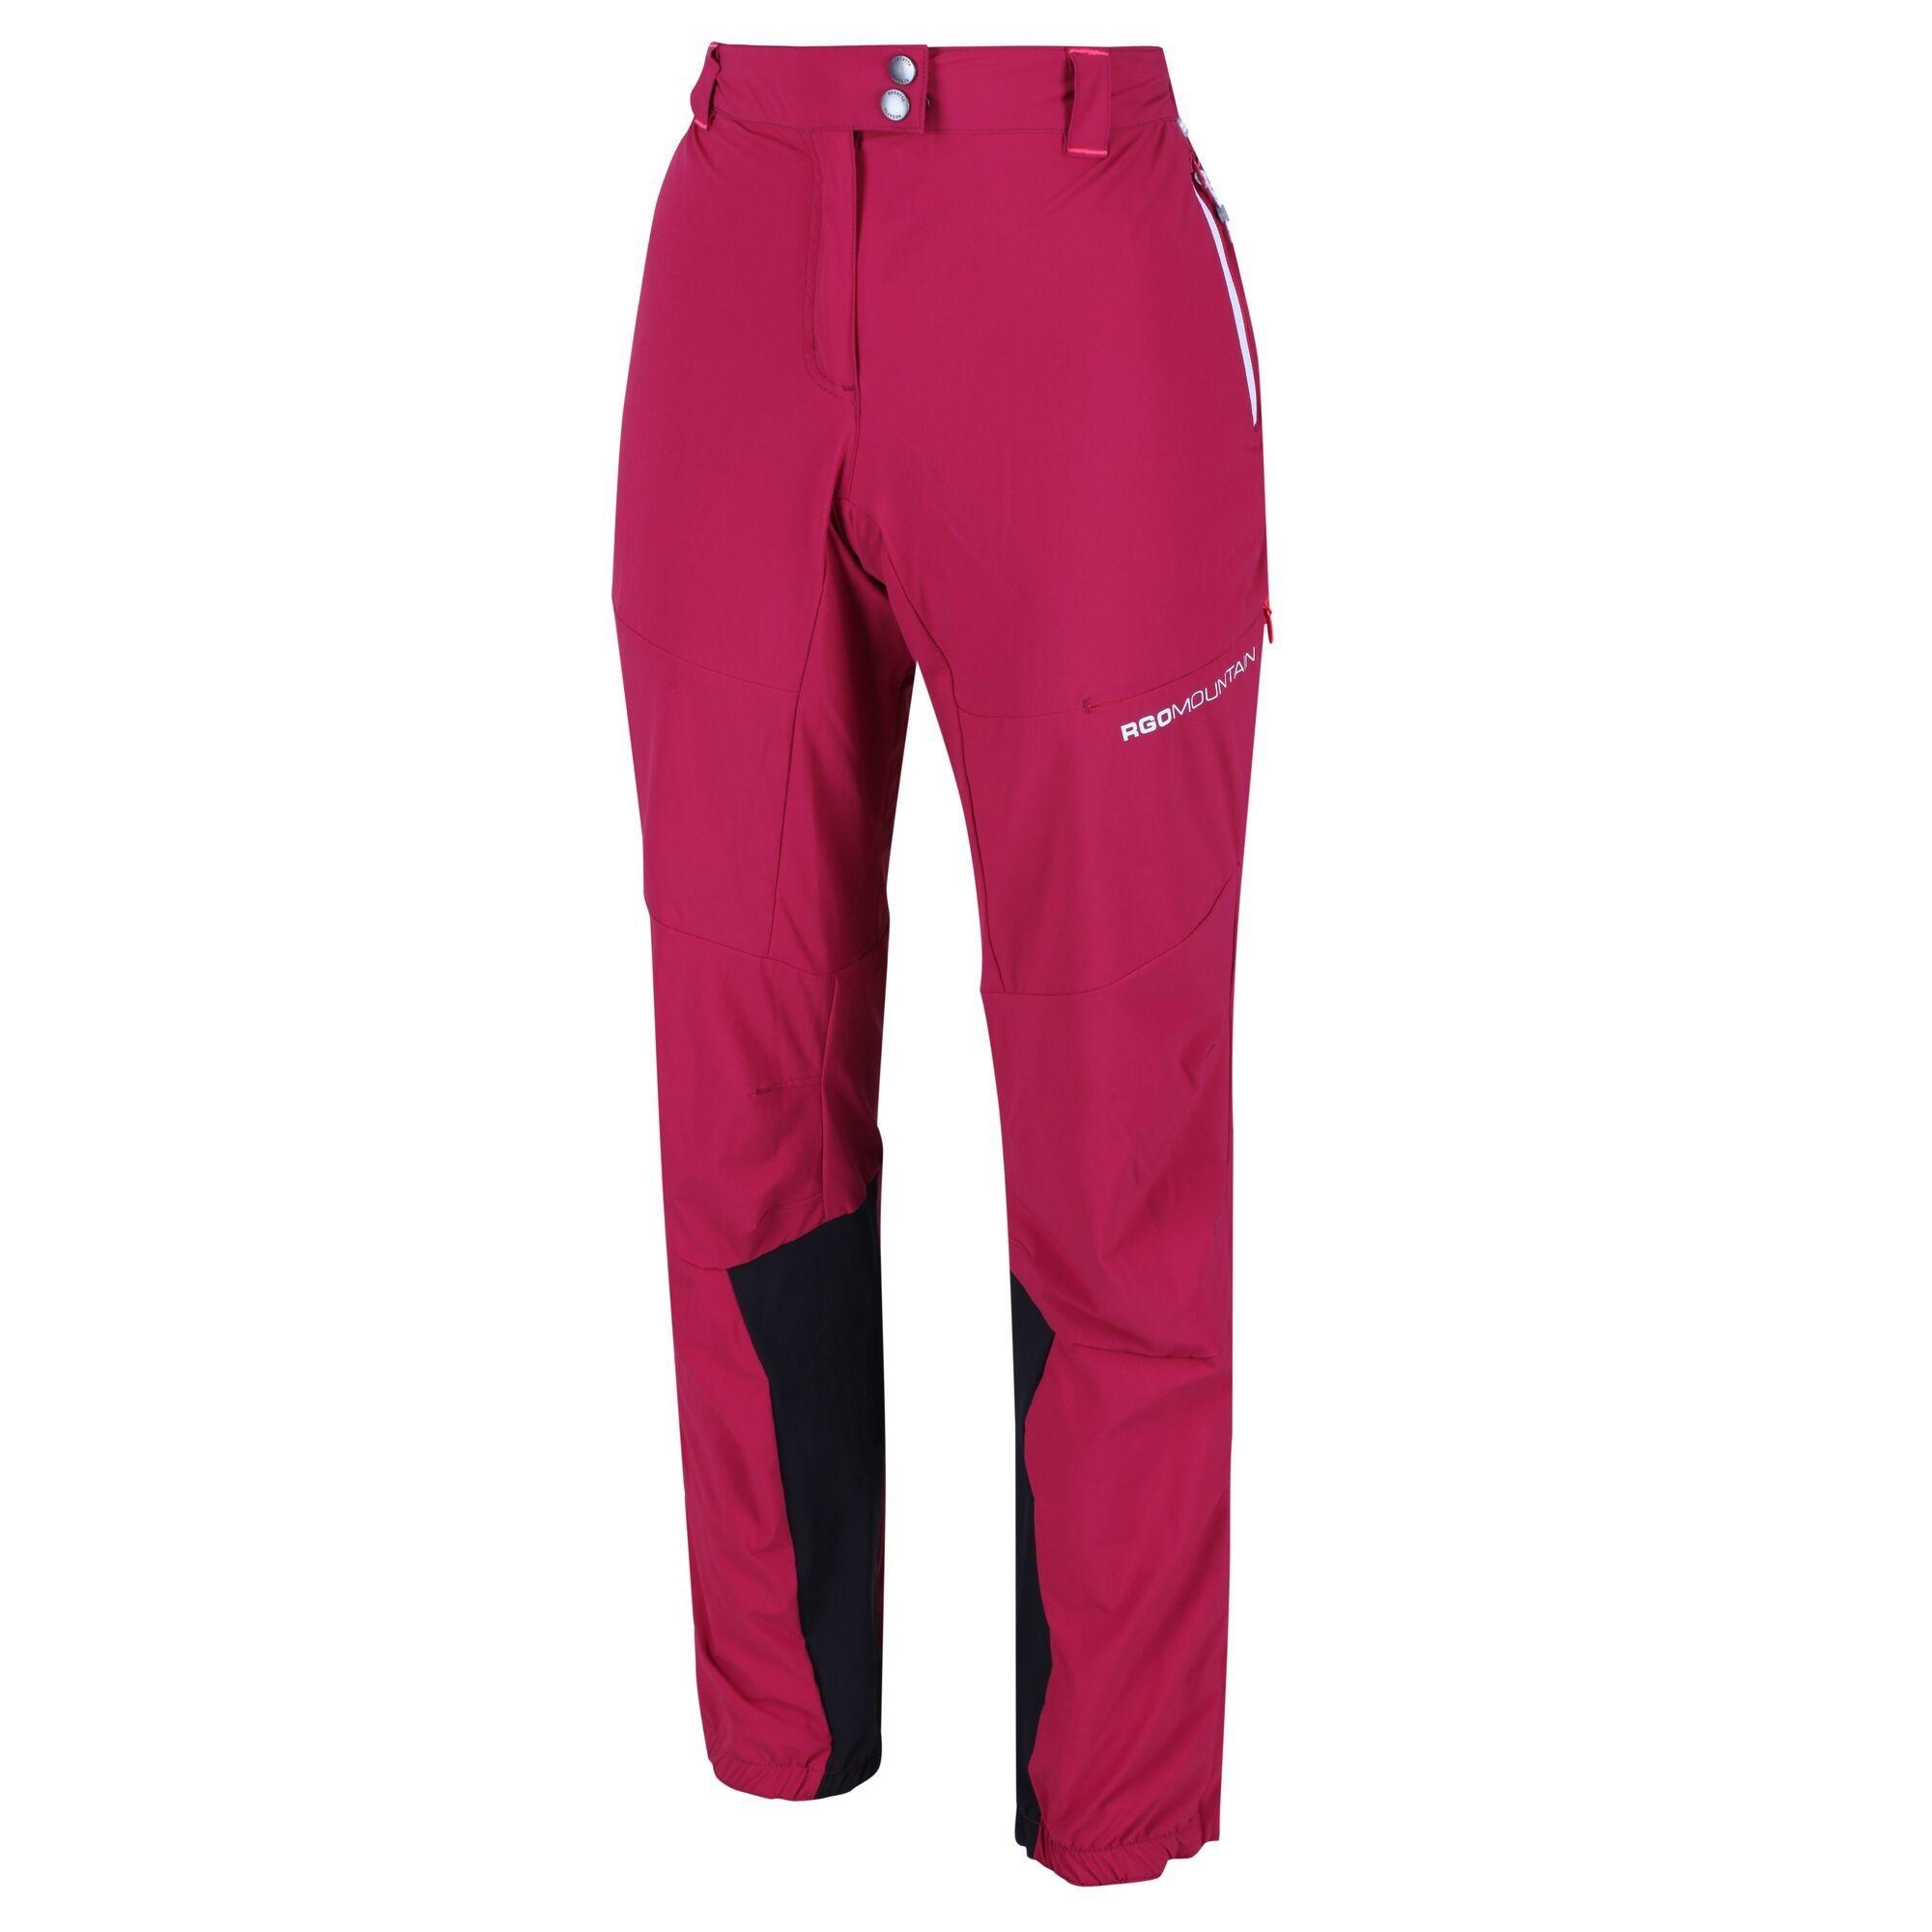 Regatta Womens/Ladies Mountain II Trousers